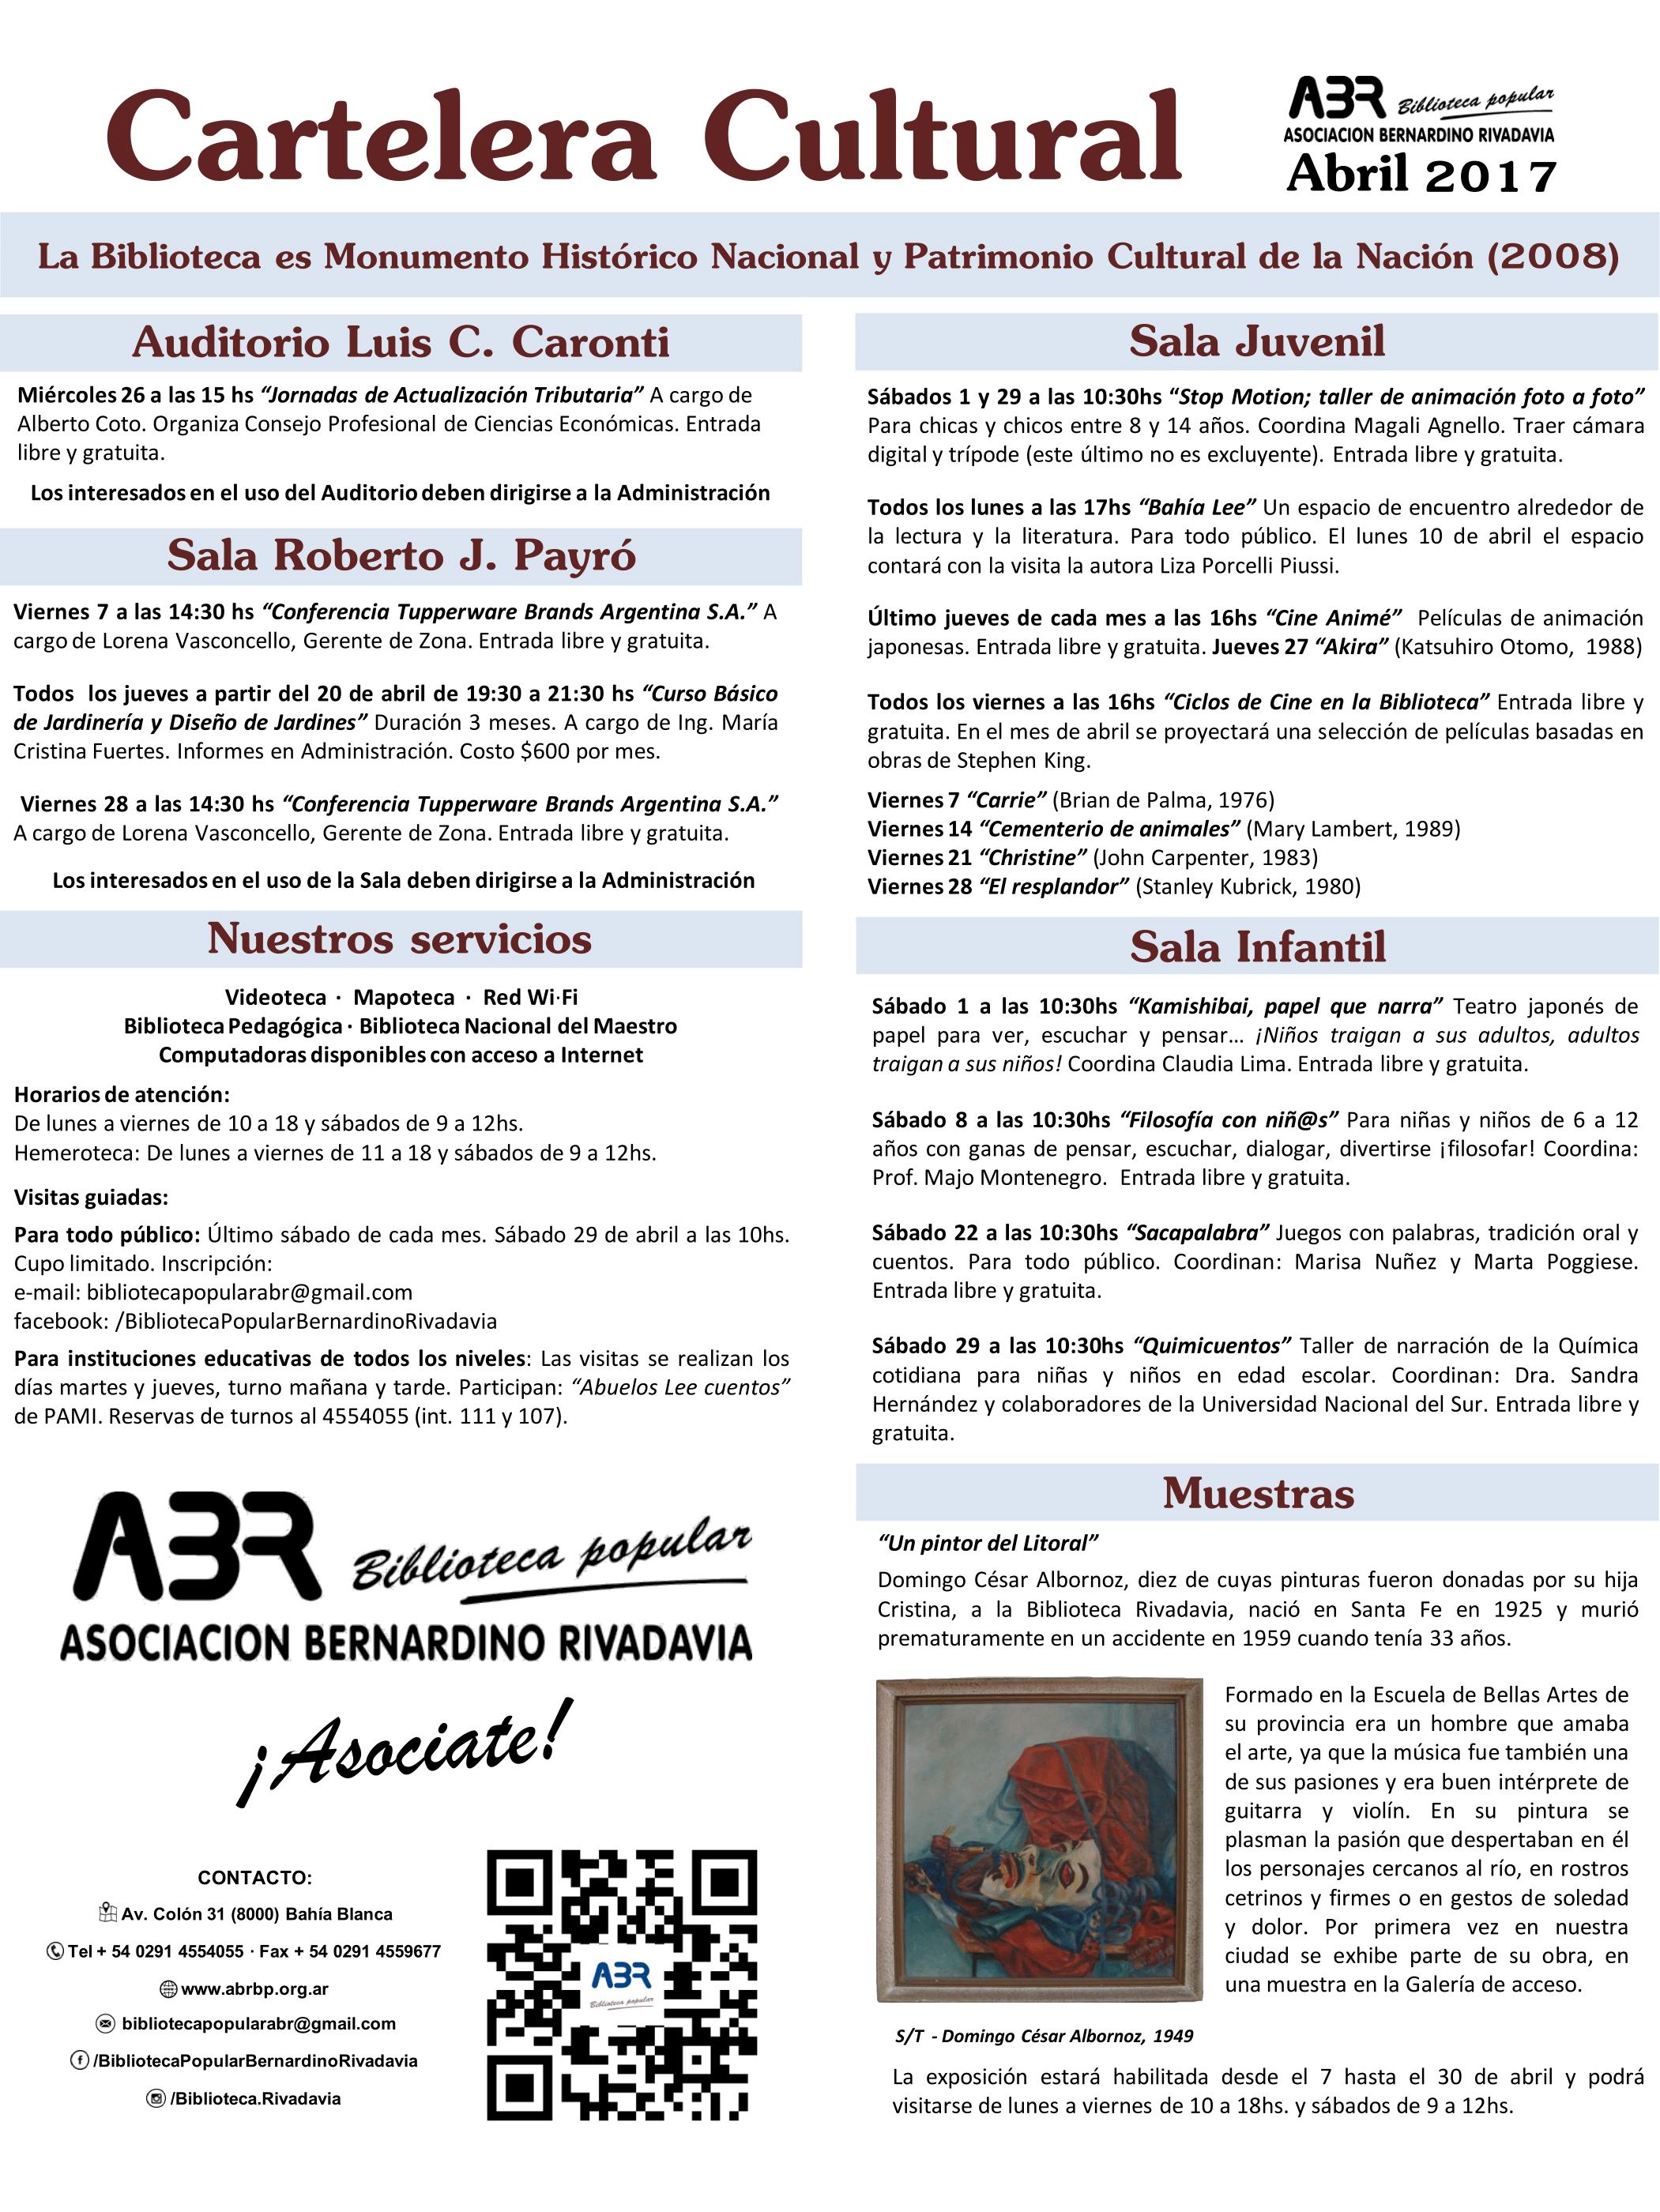 Cartelera-ABR-Abril